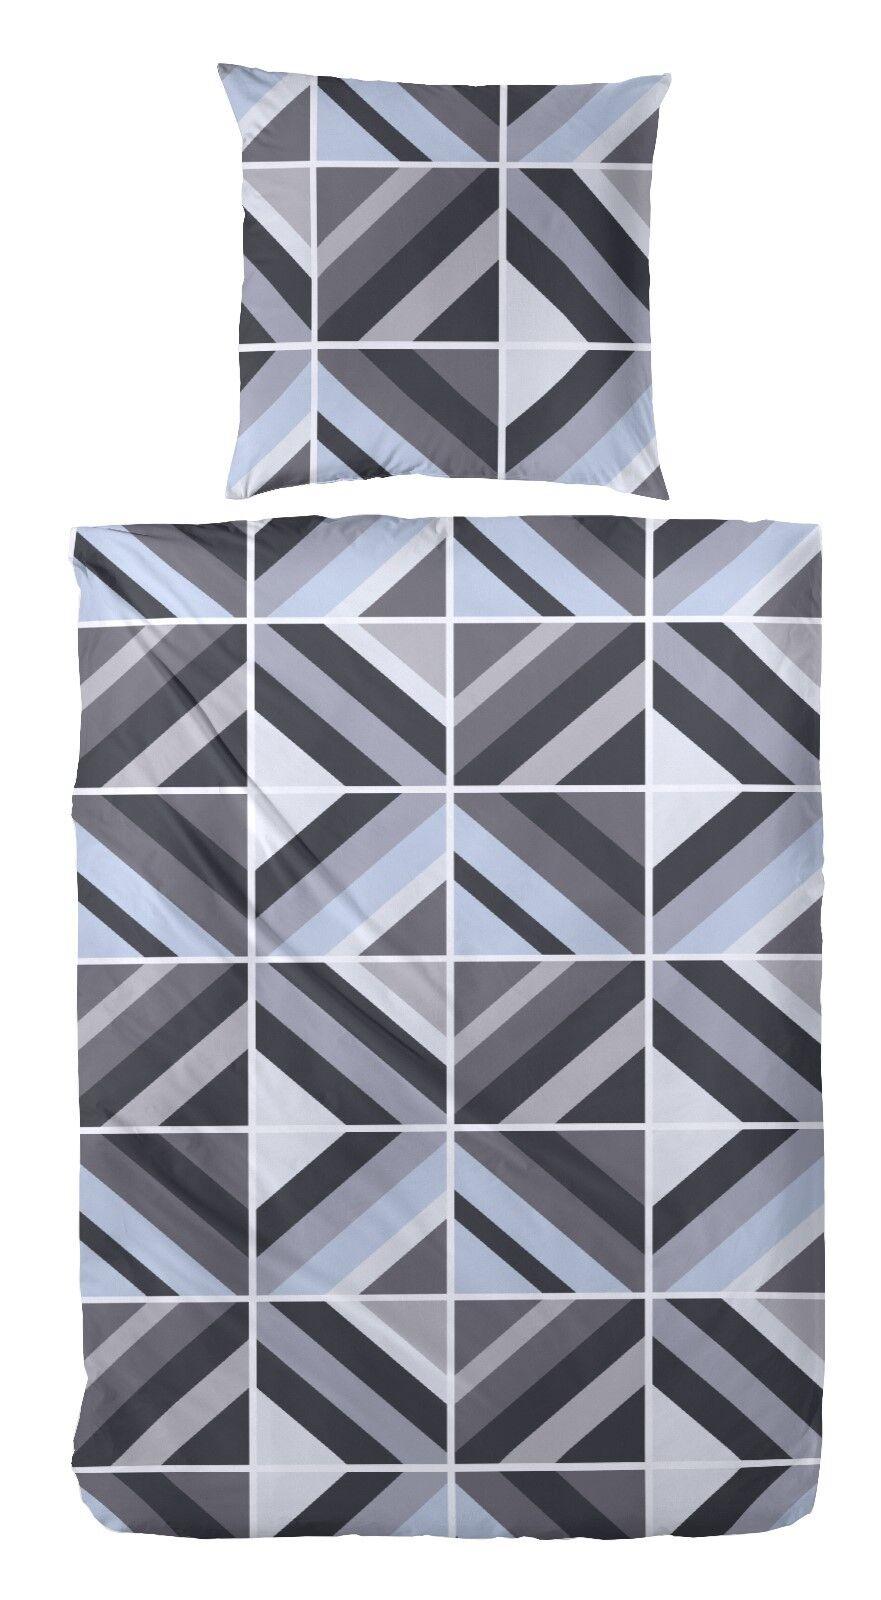 4 tlg. Biber Bettwäsche blau grau schwarz 2x80x80+135x200 cm  173050-038B10